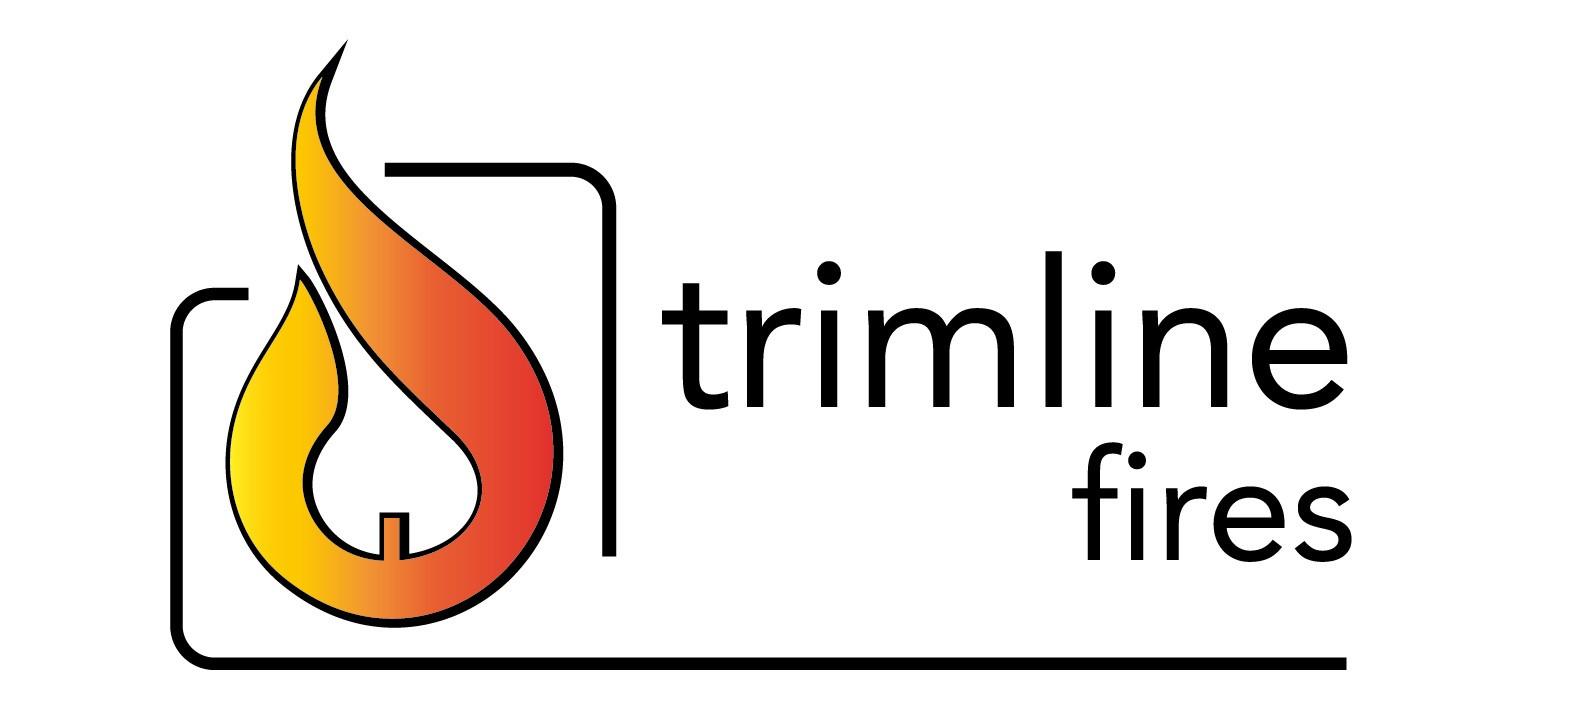 TrimlineFires_logo krb-pec